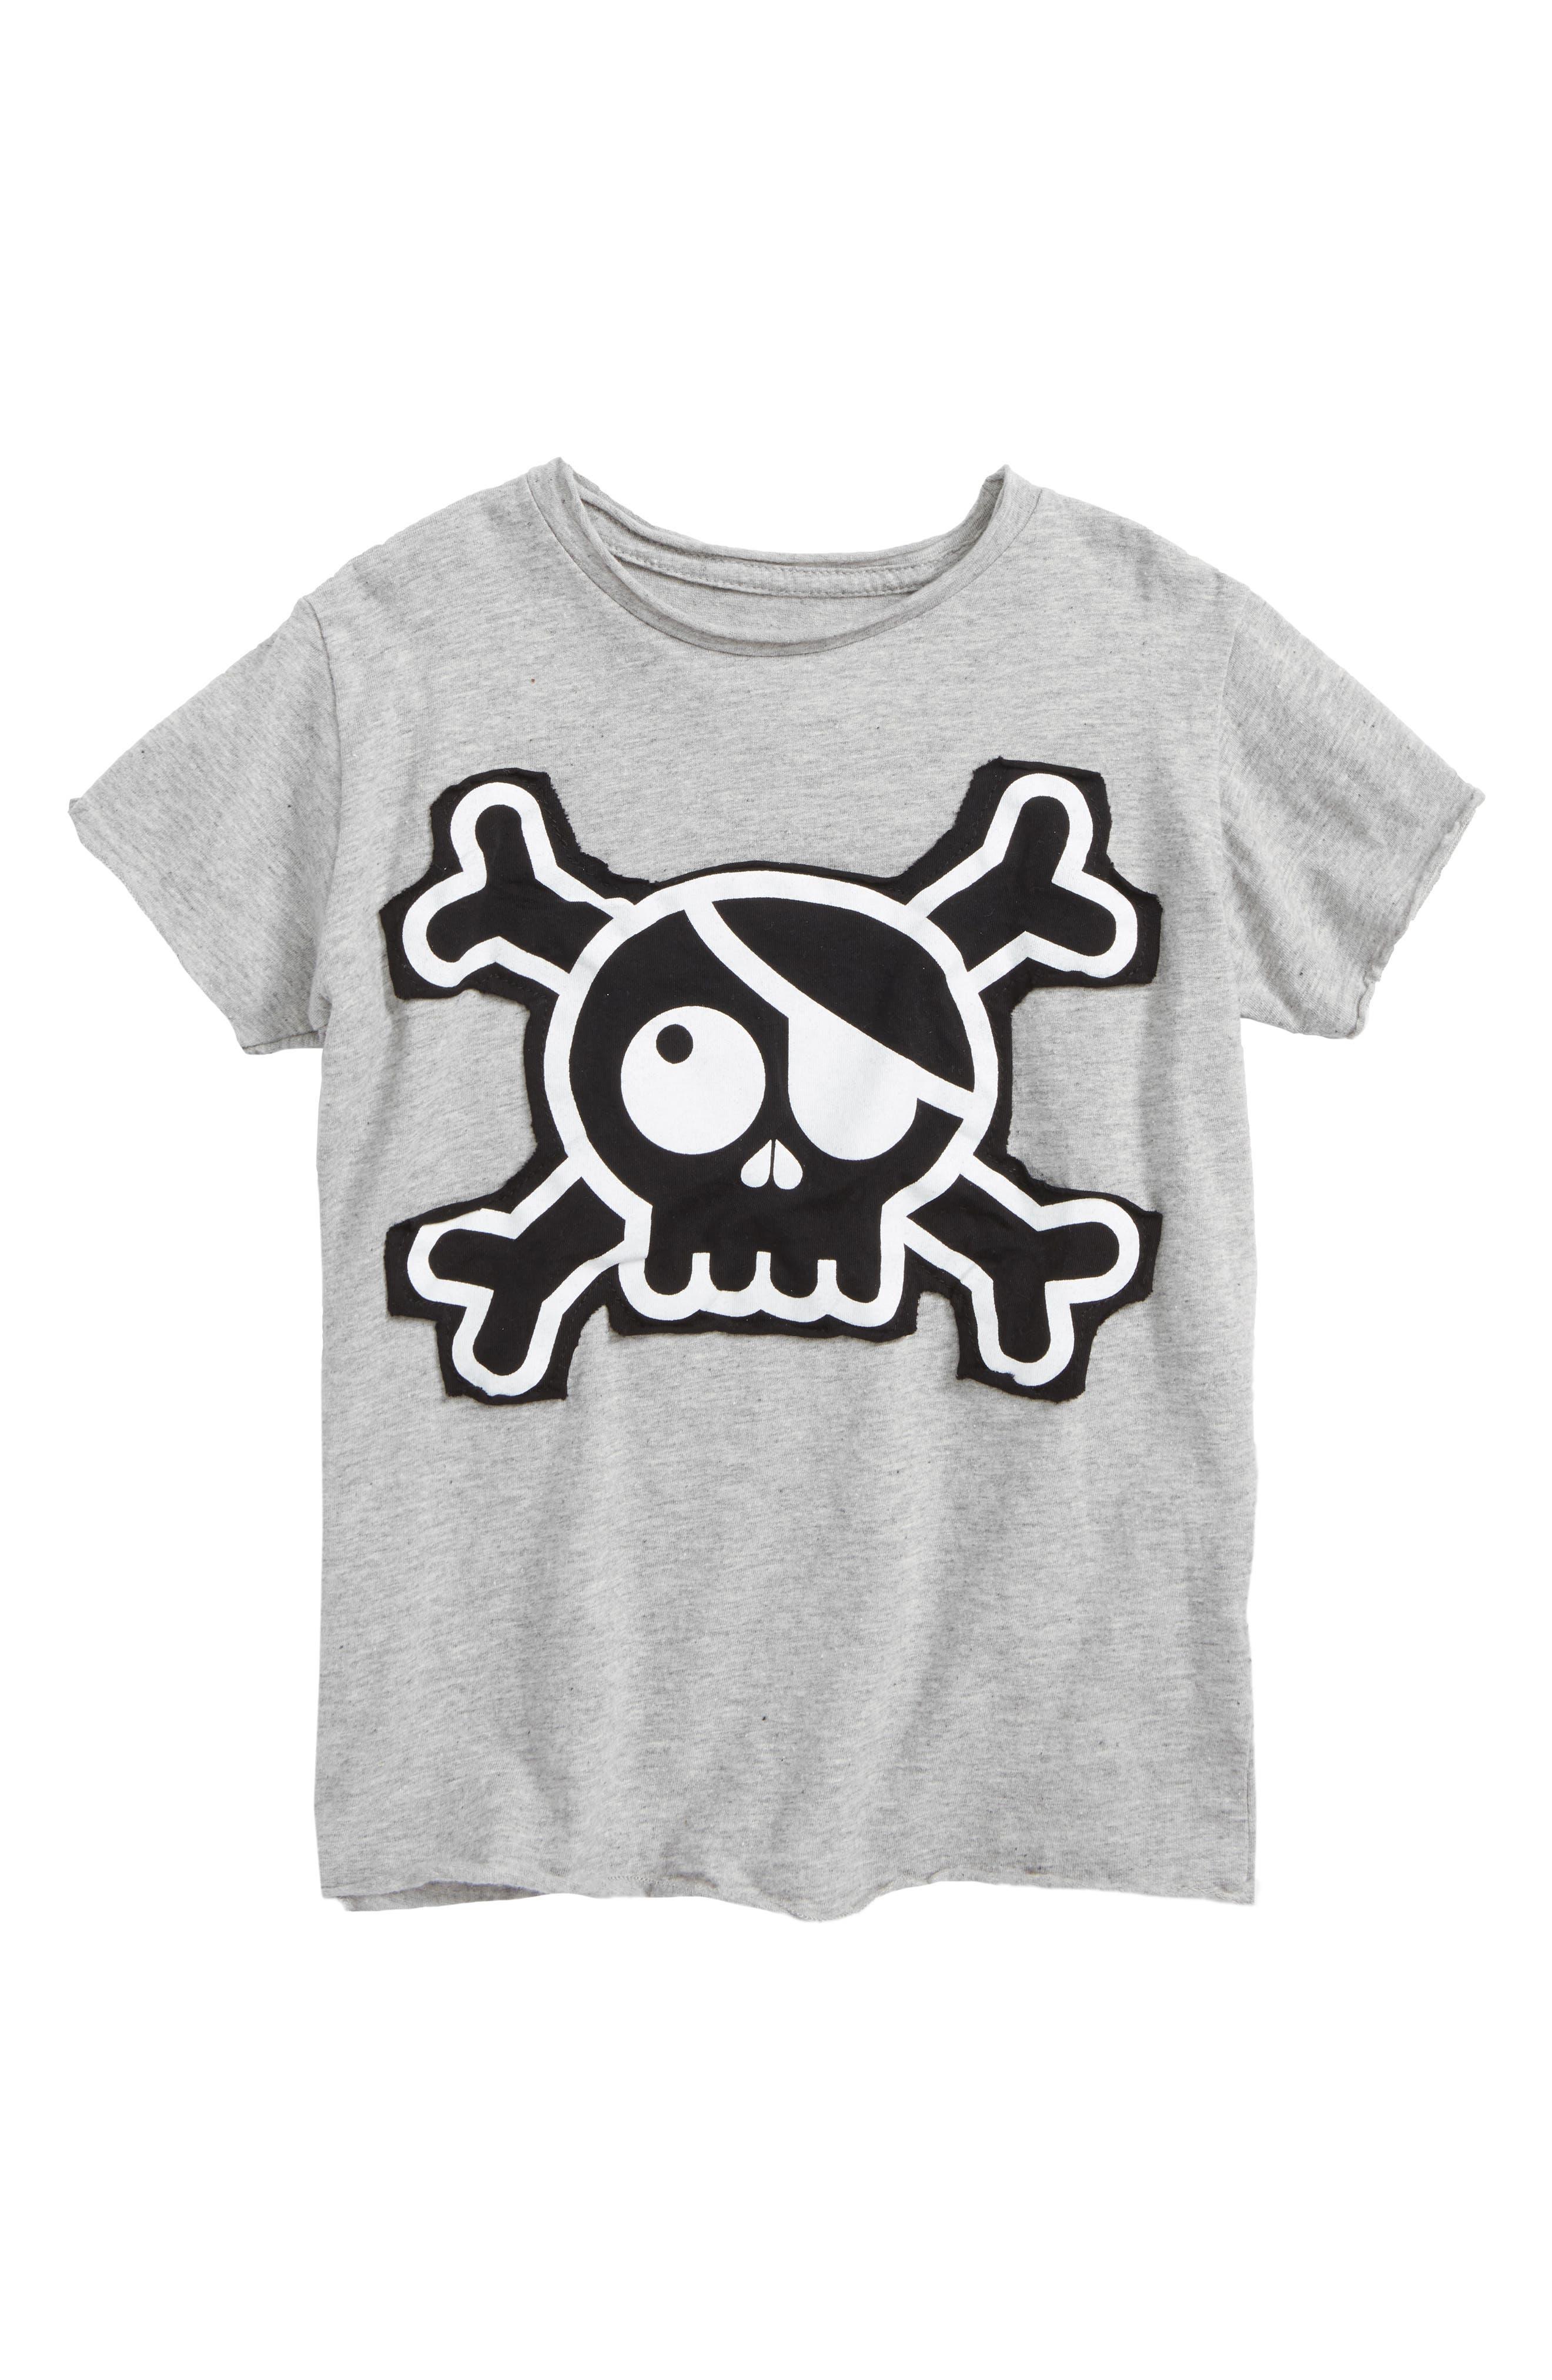 Skull Appliqué T-Shirt,                             Main thumbnail 1, color,                             Heather Grey